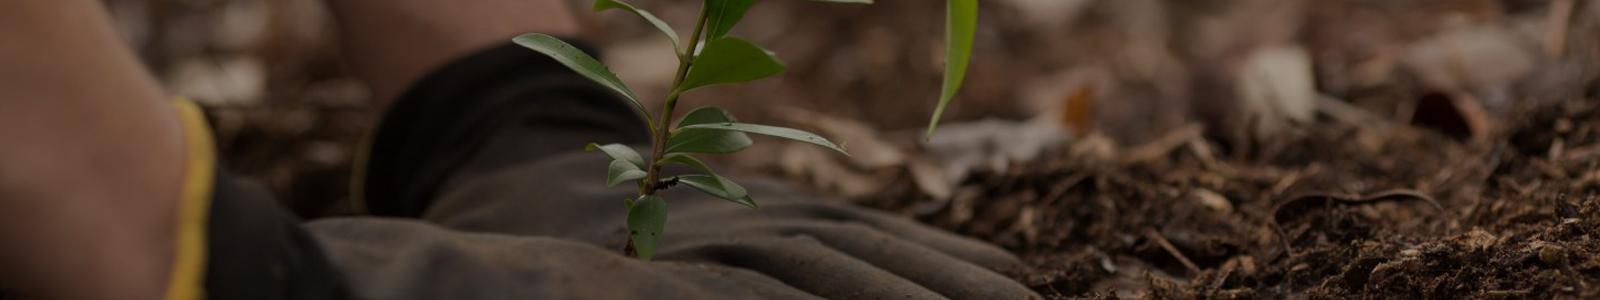 Baum Tree Planting